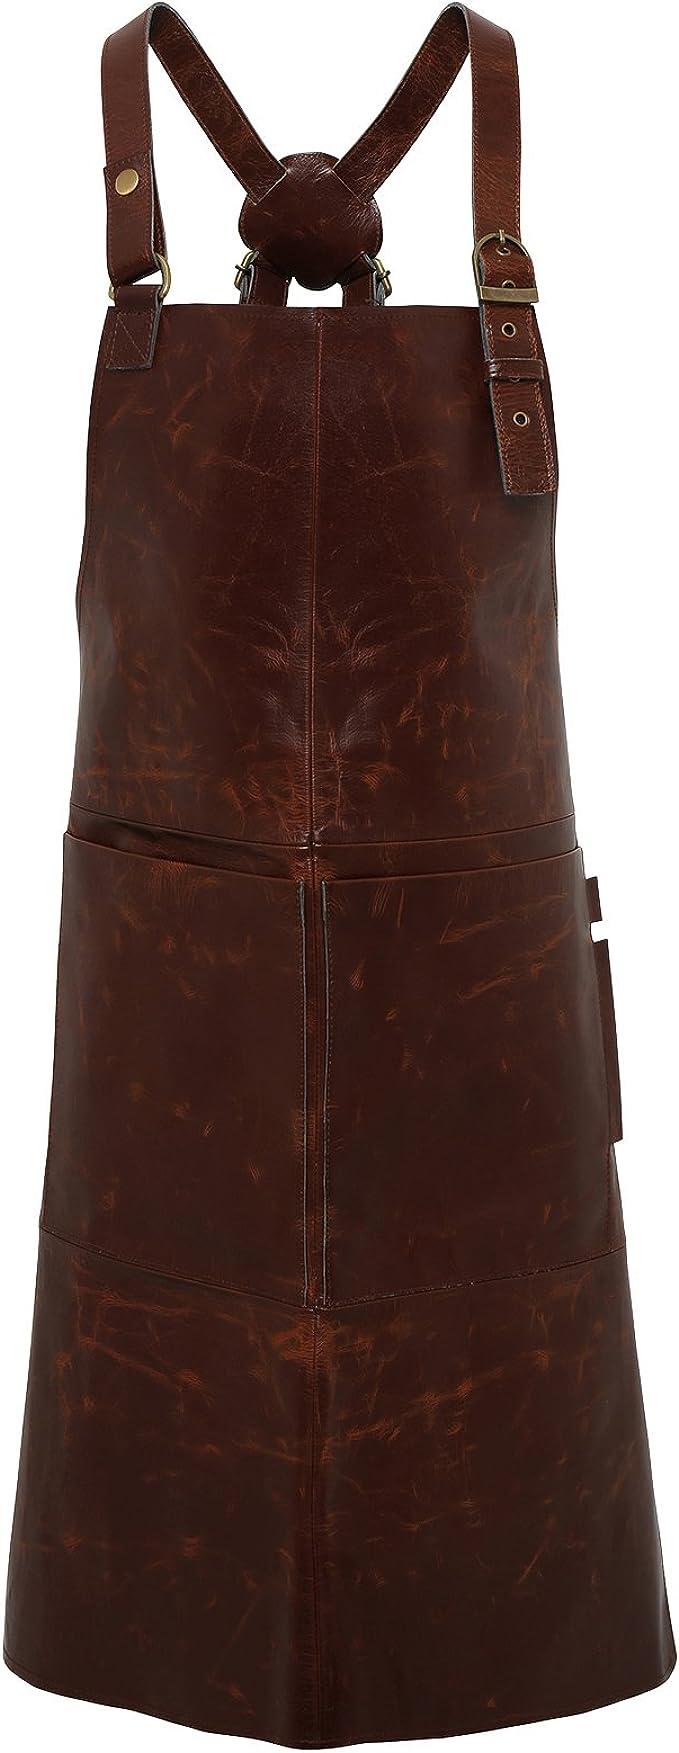 PREMIER LEATHER PR140 Artisan real leather cross back bib apron